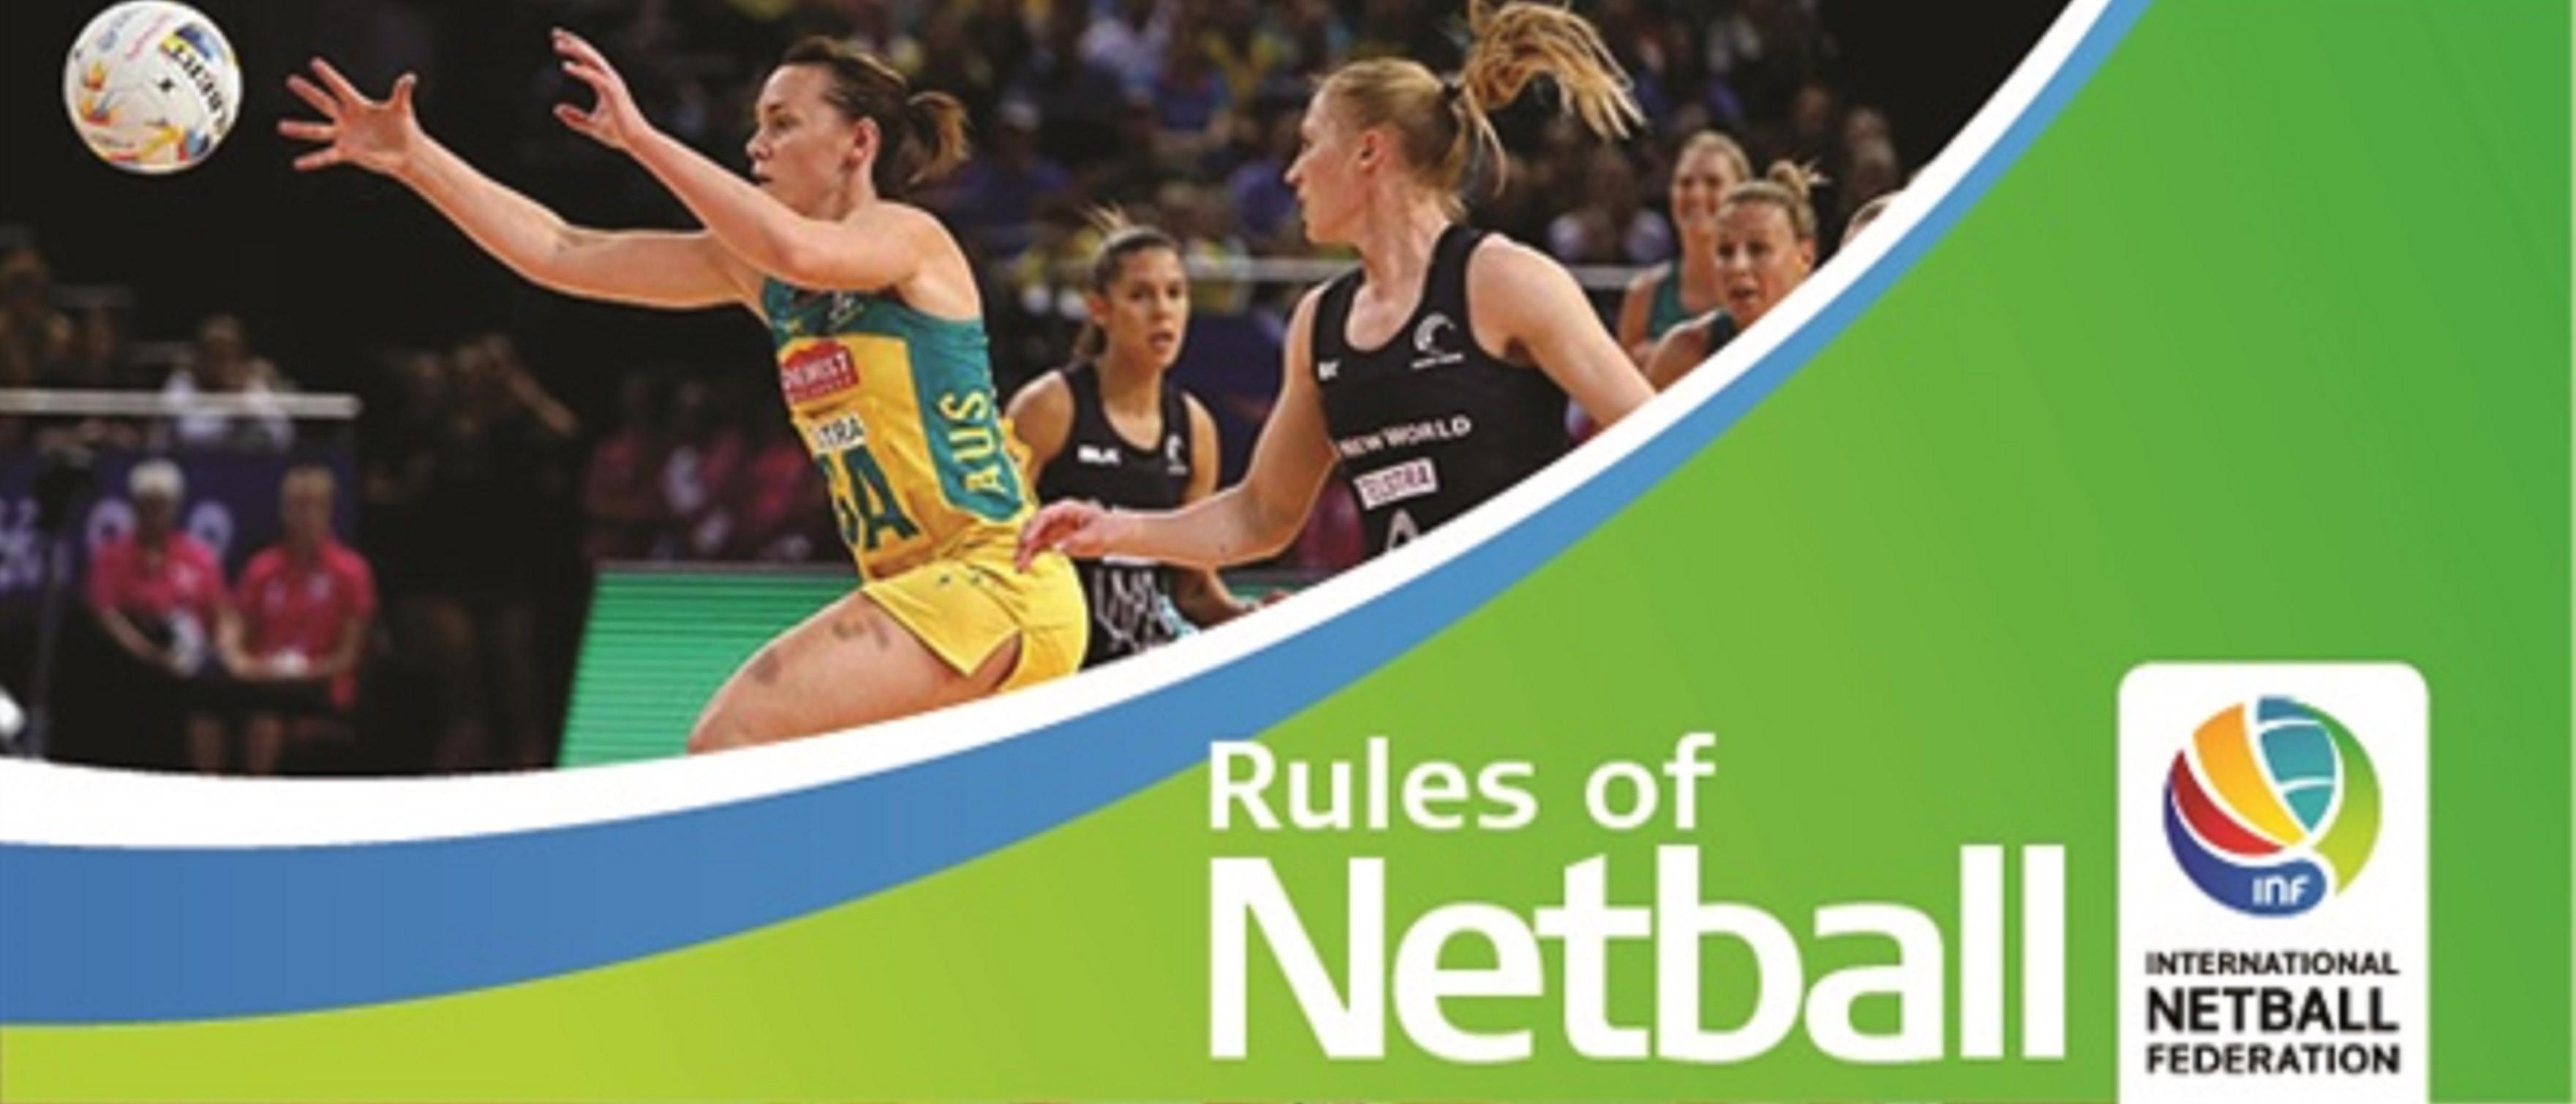 rules-of-netball-banner